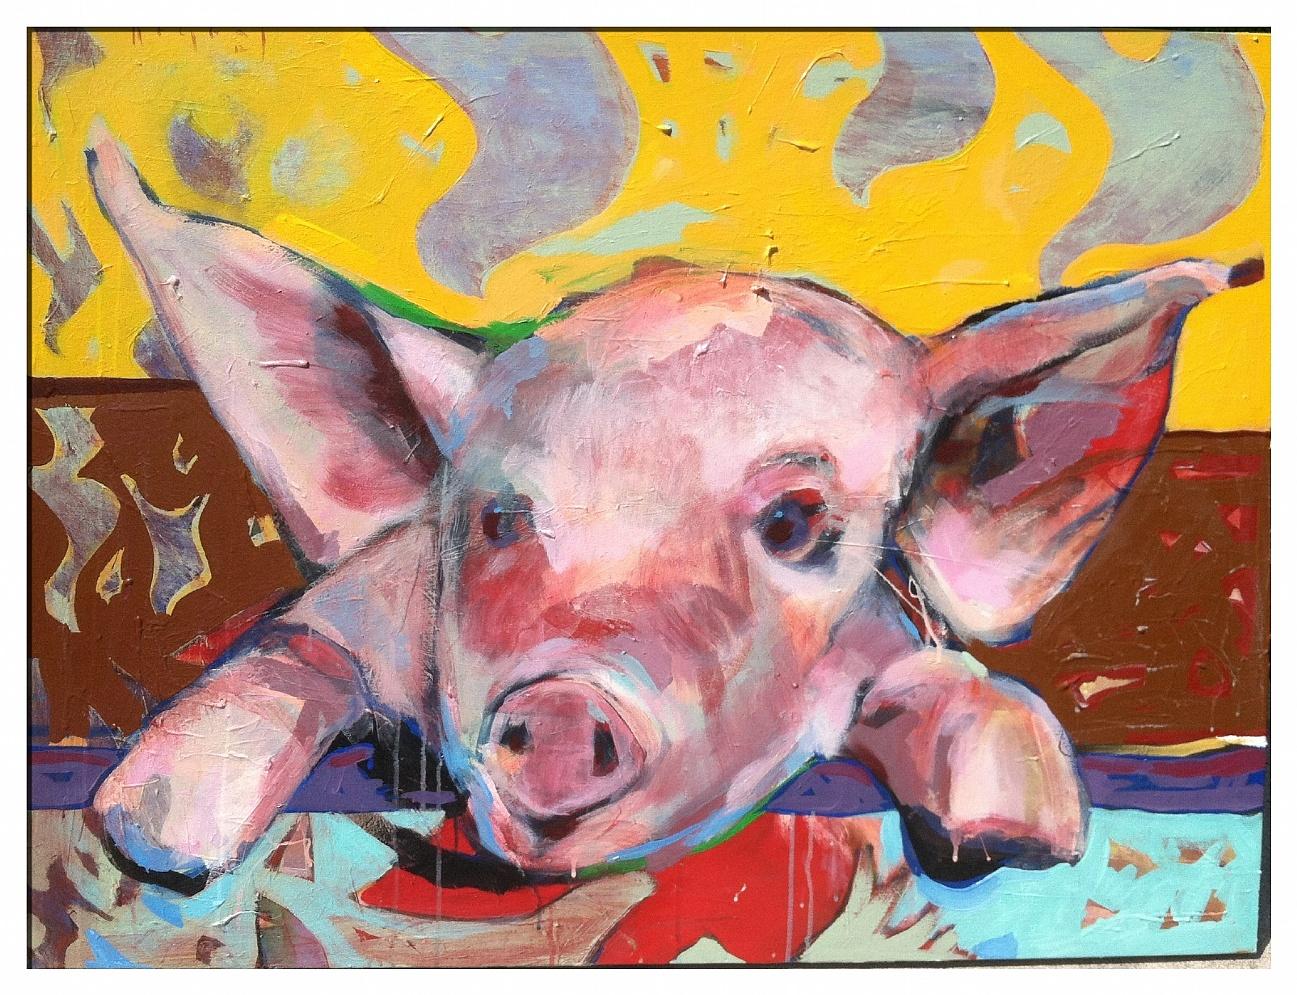 Tim Jaeger, Pig, 2012